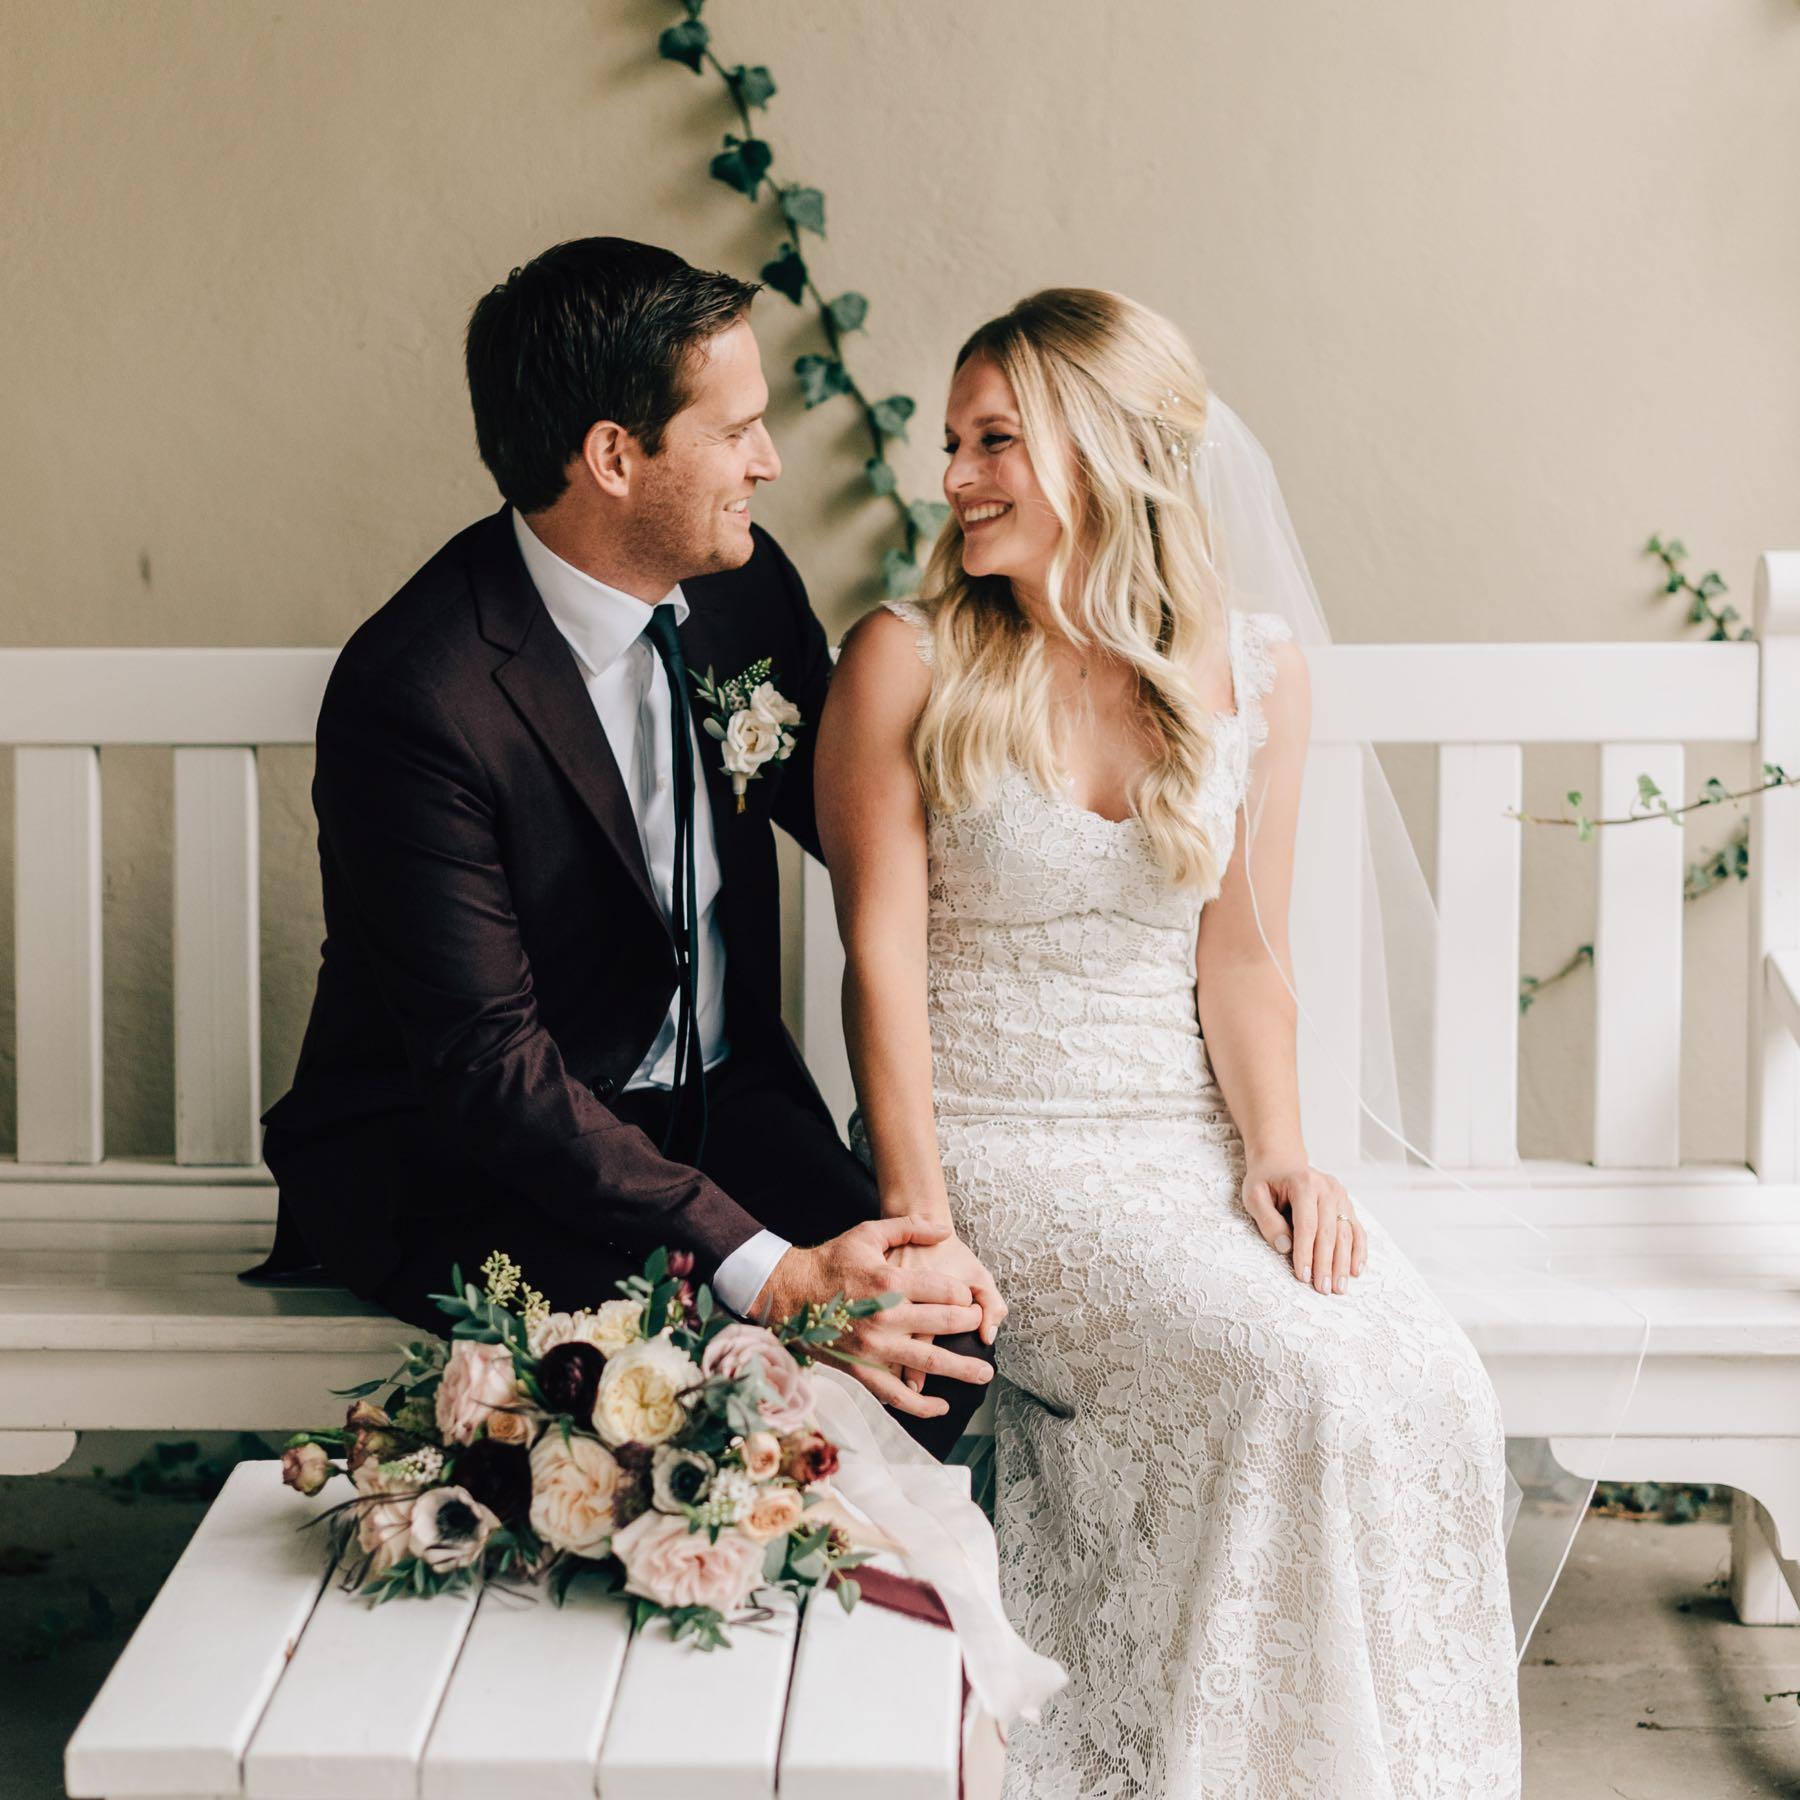 footer-wedding-image-5